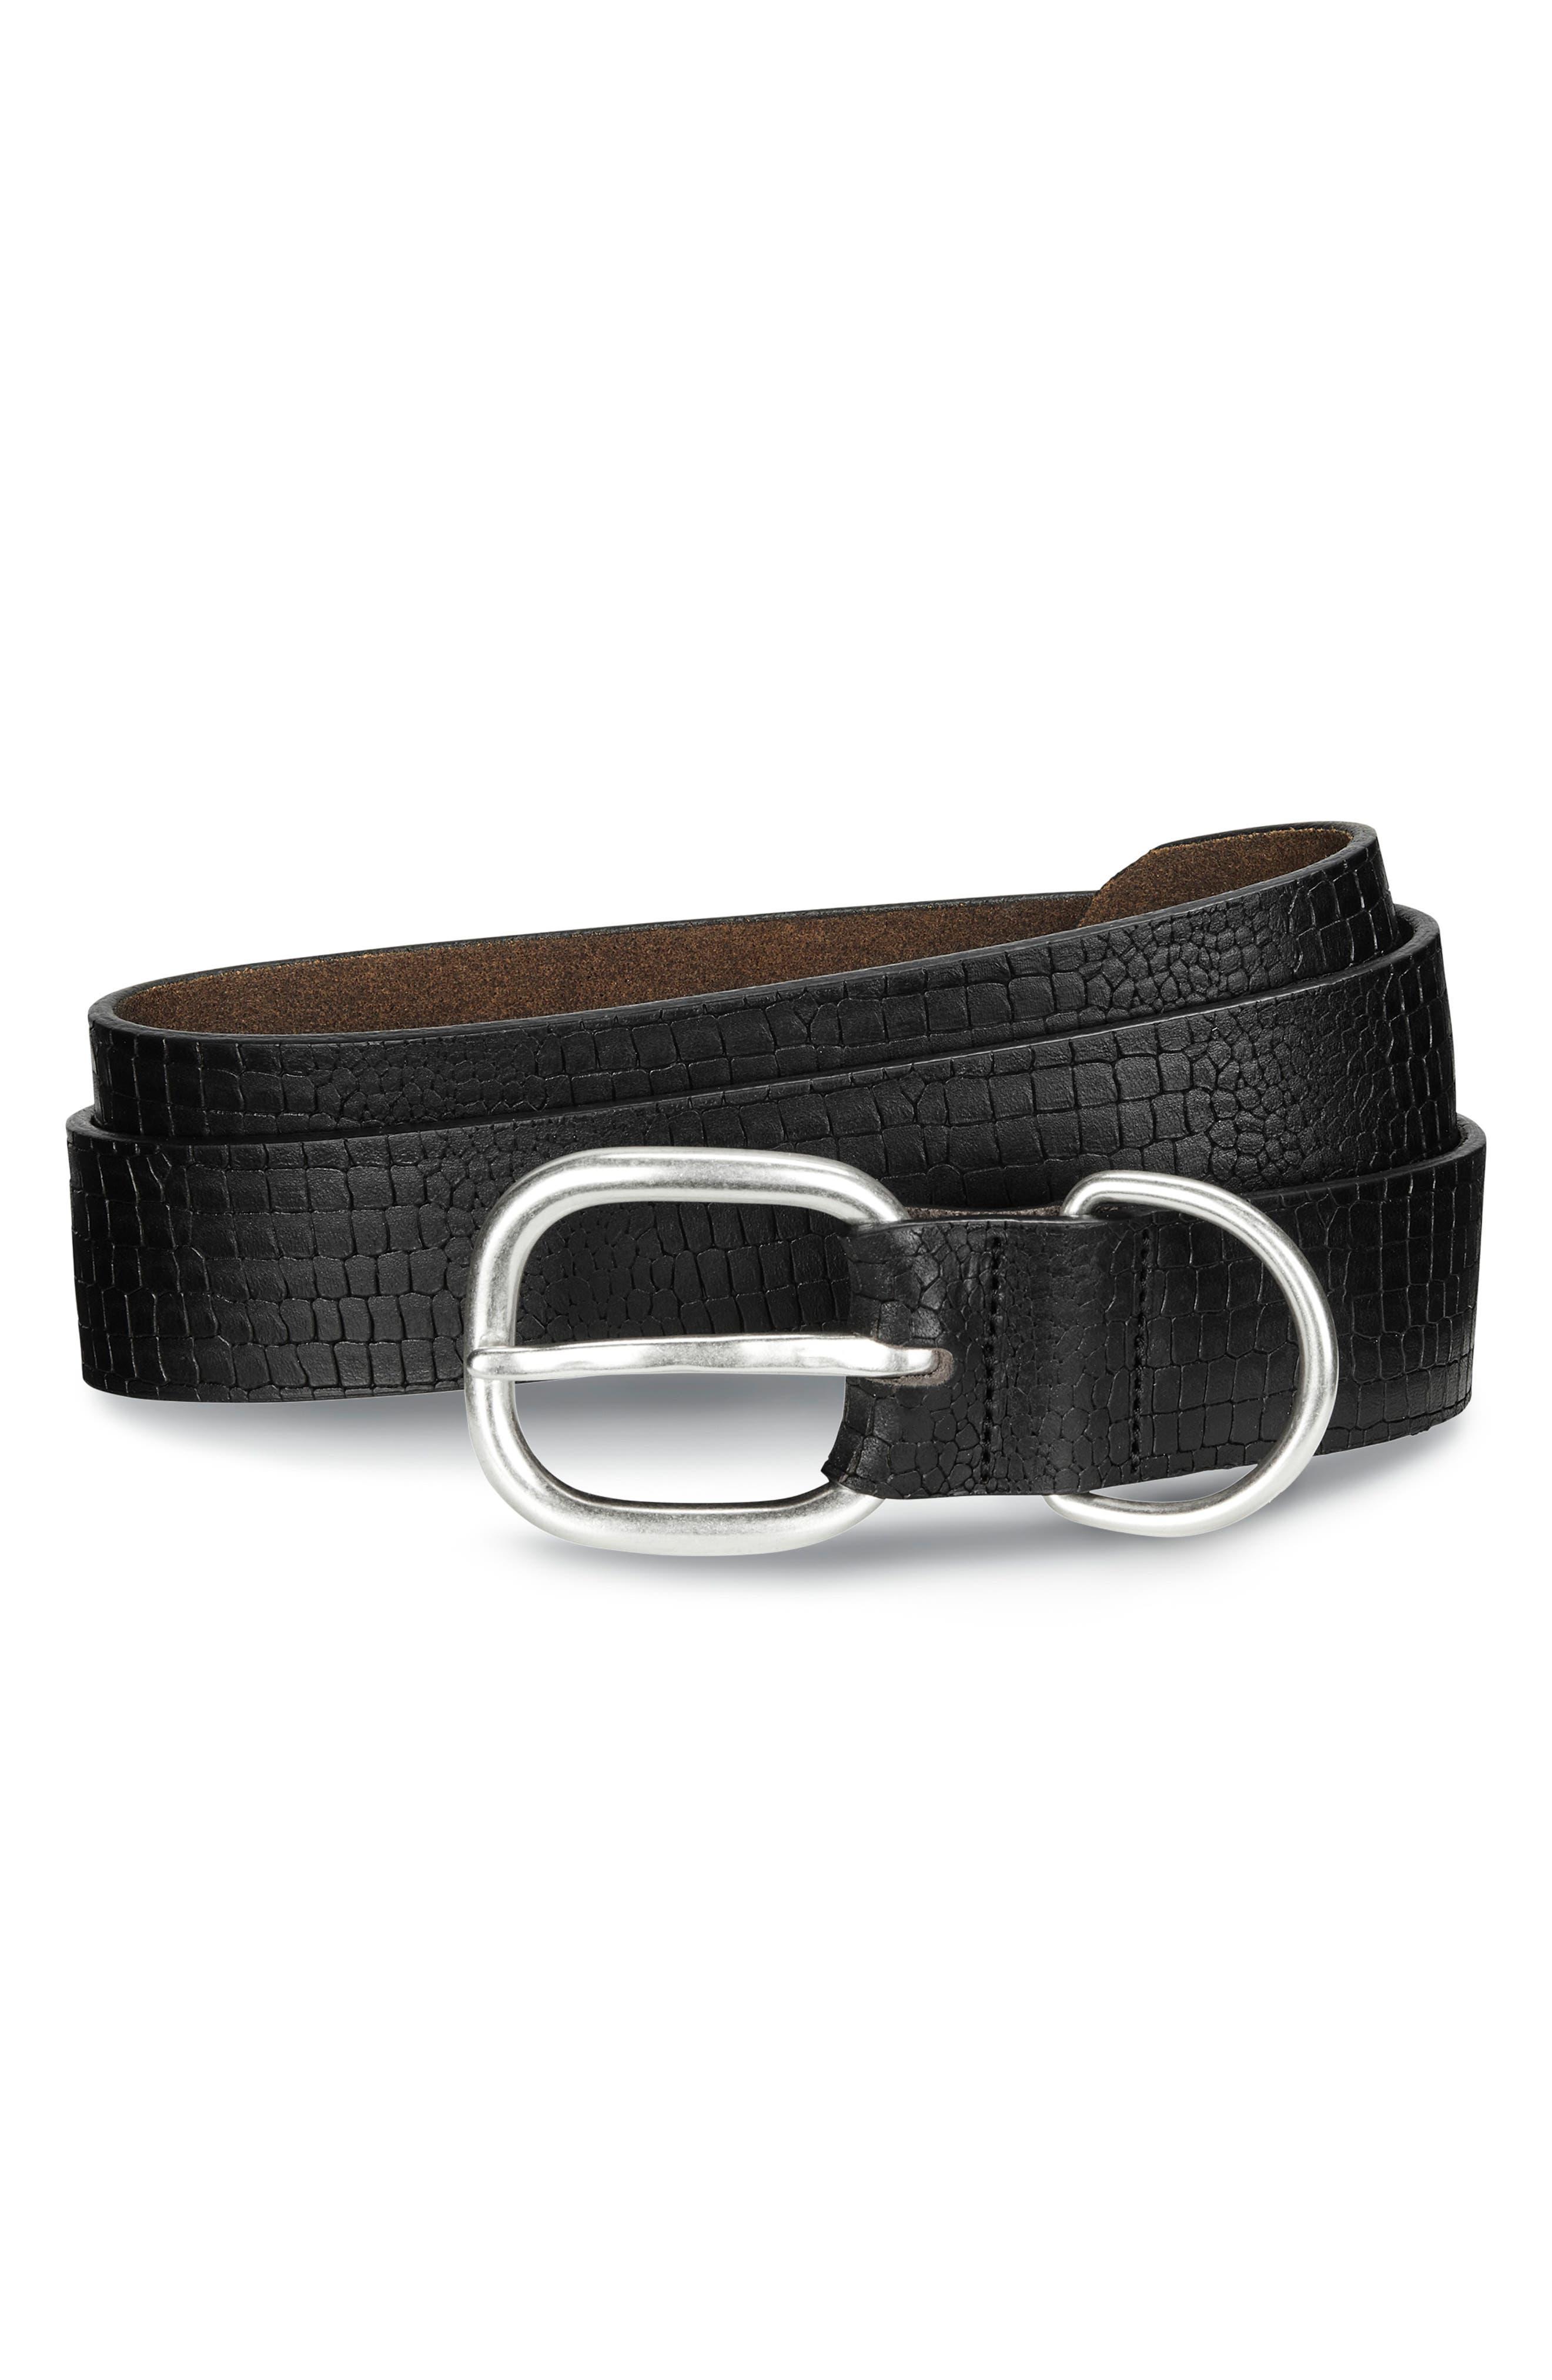 Allen Edmonds Croco Print Leather Belt, Black